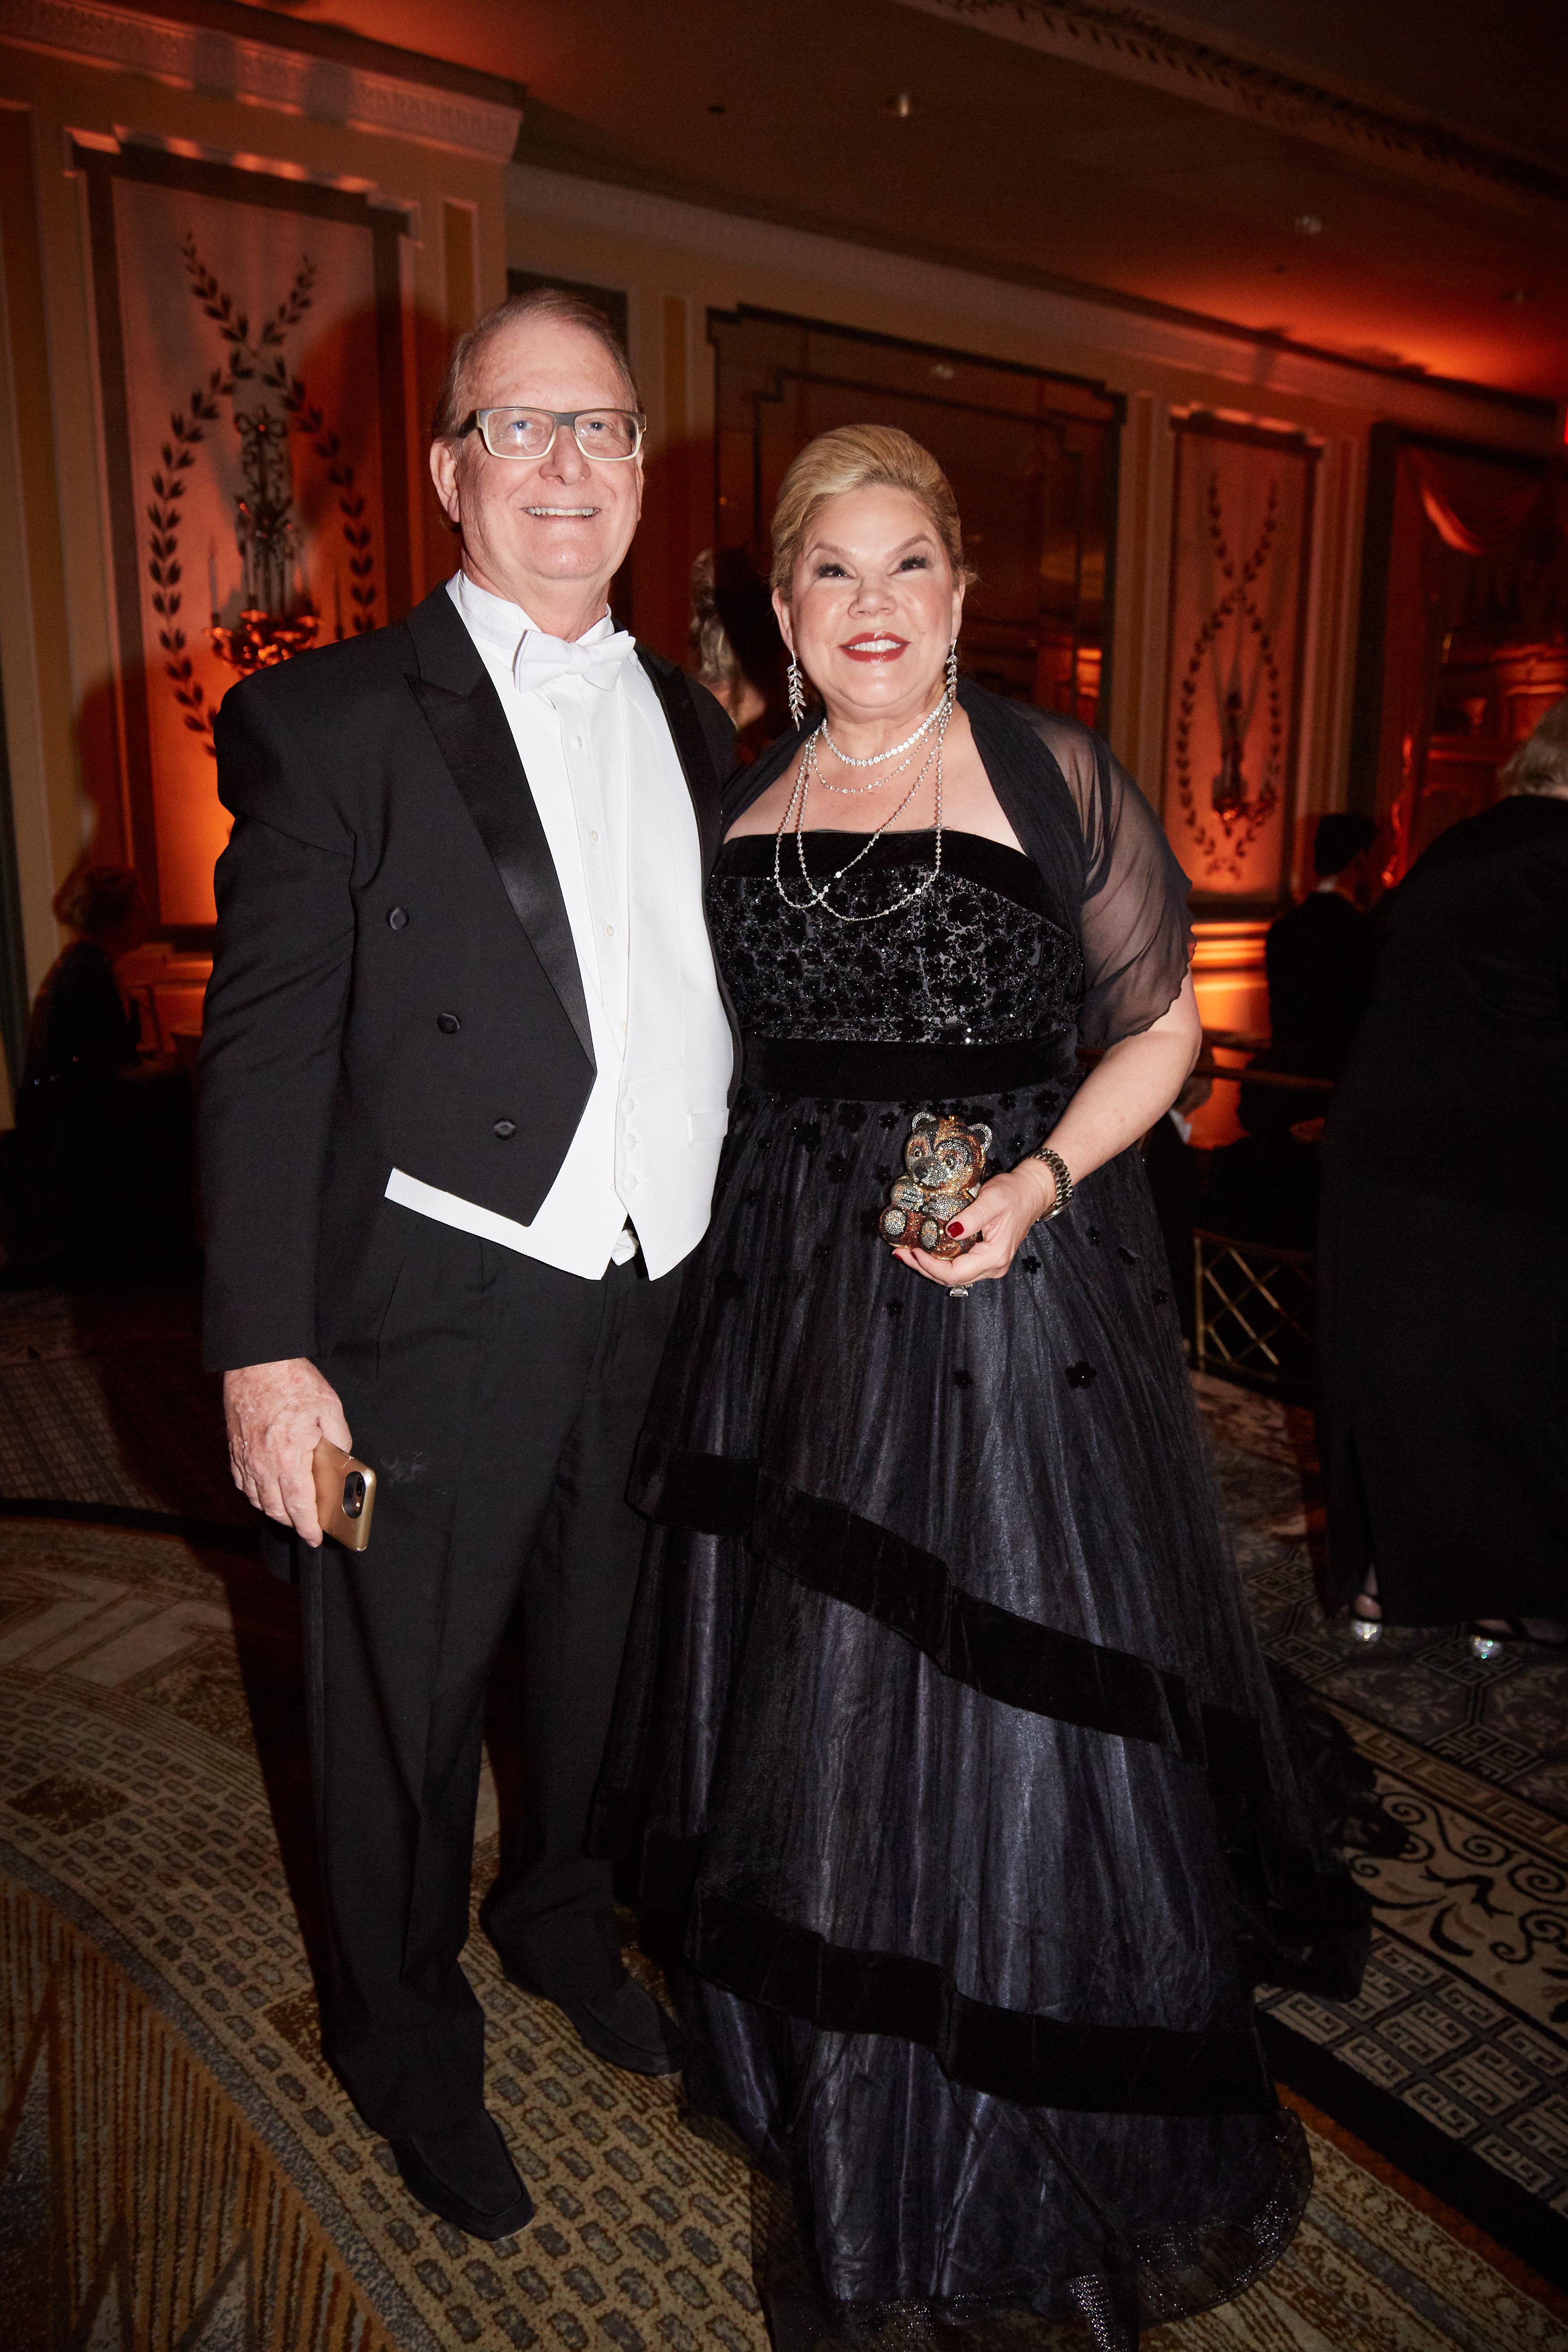 Steve and Ava Late